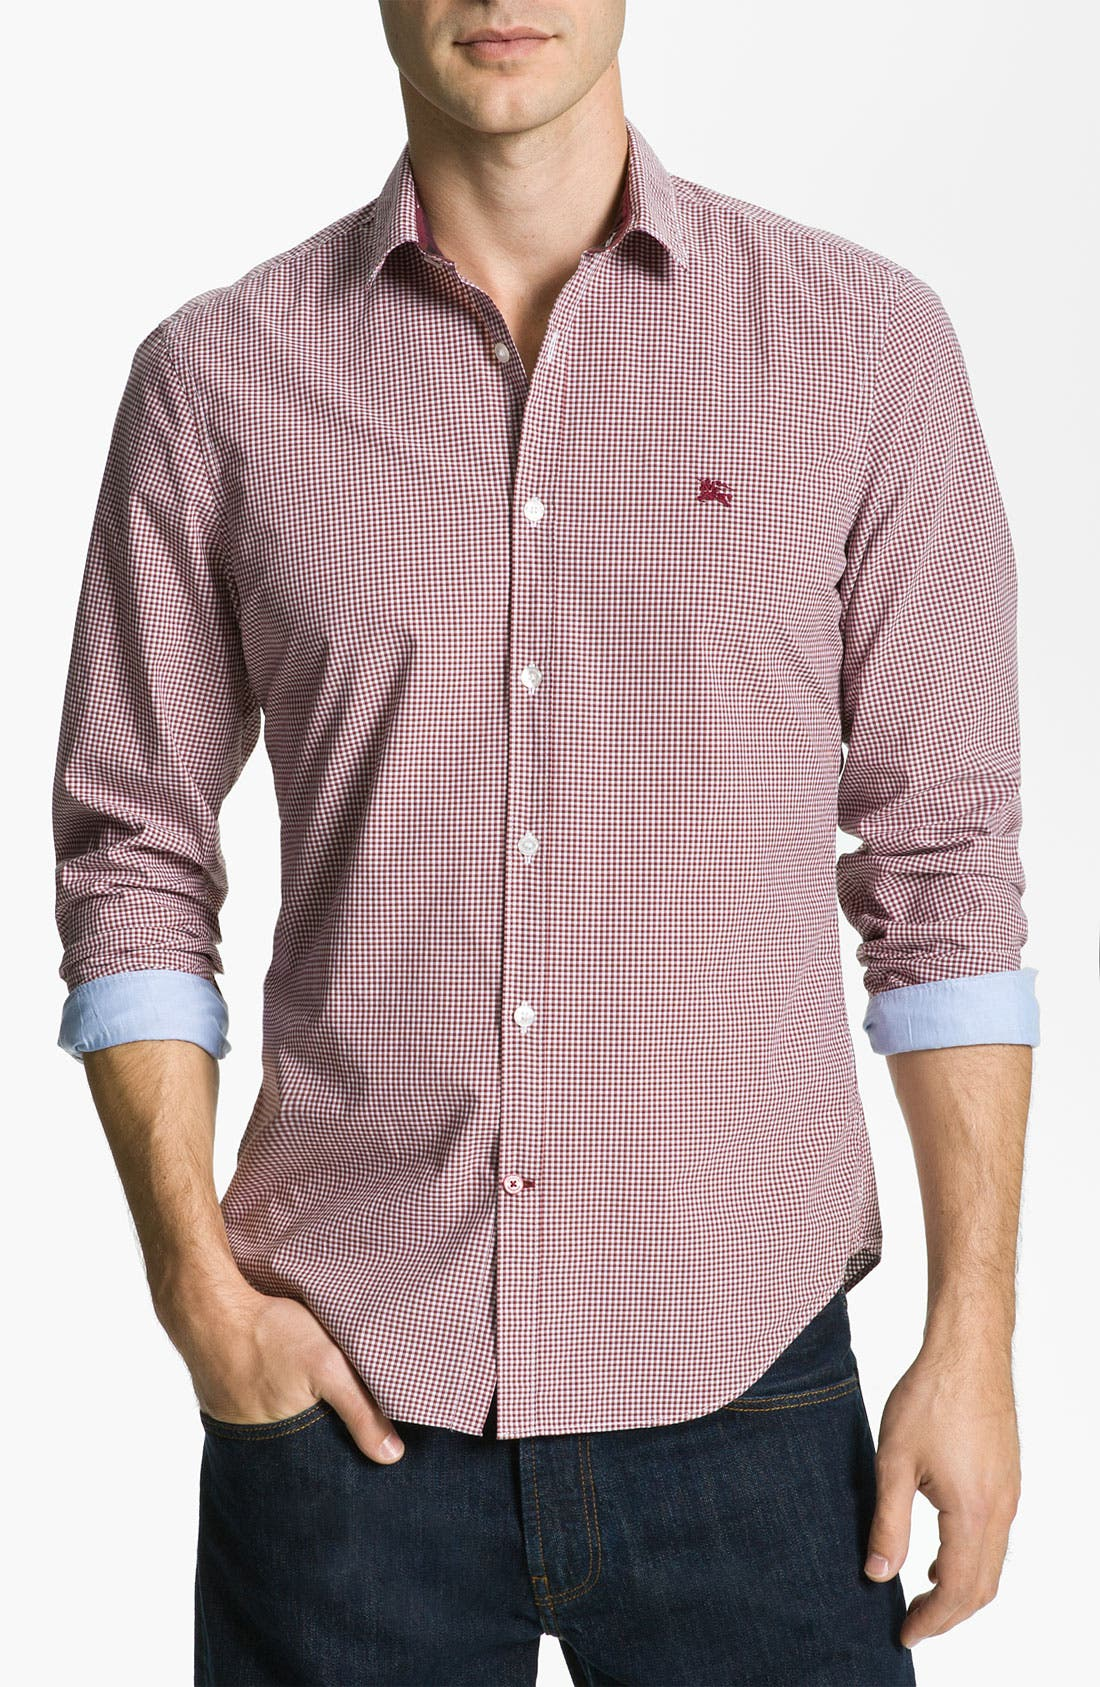 Alternate Image 1 Selected - Burberry Brit Trim Fit Sport Shirt